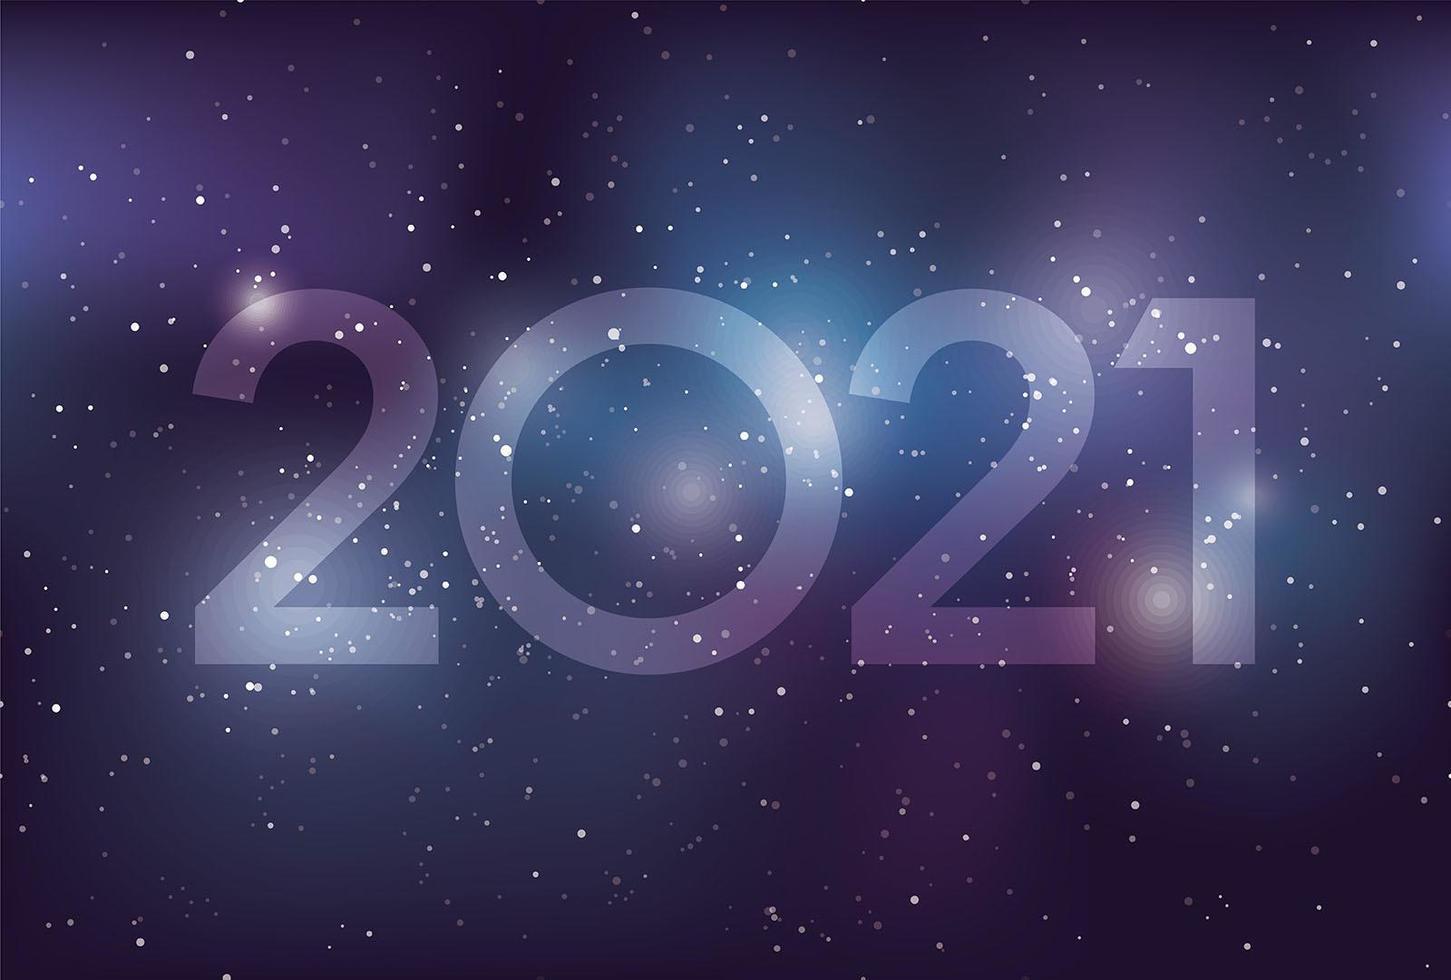 Jahr 2021 Neujahrsgrußkarte Raumvorlage vektor